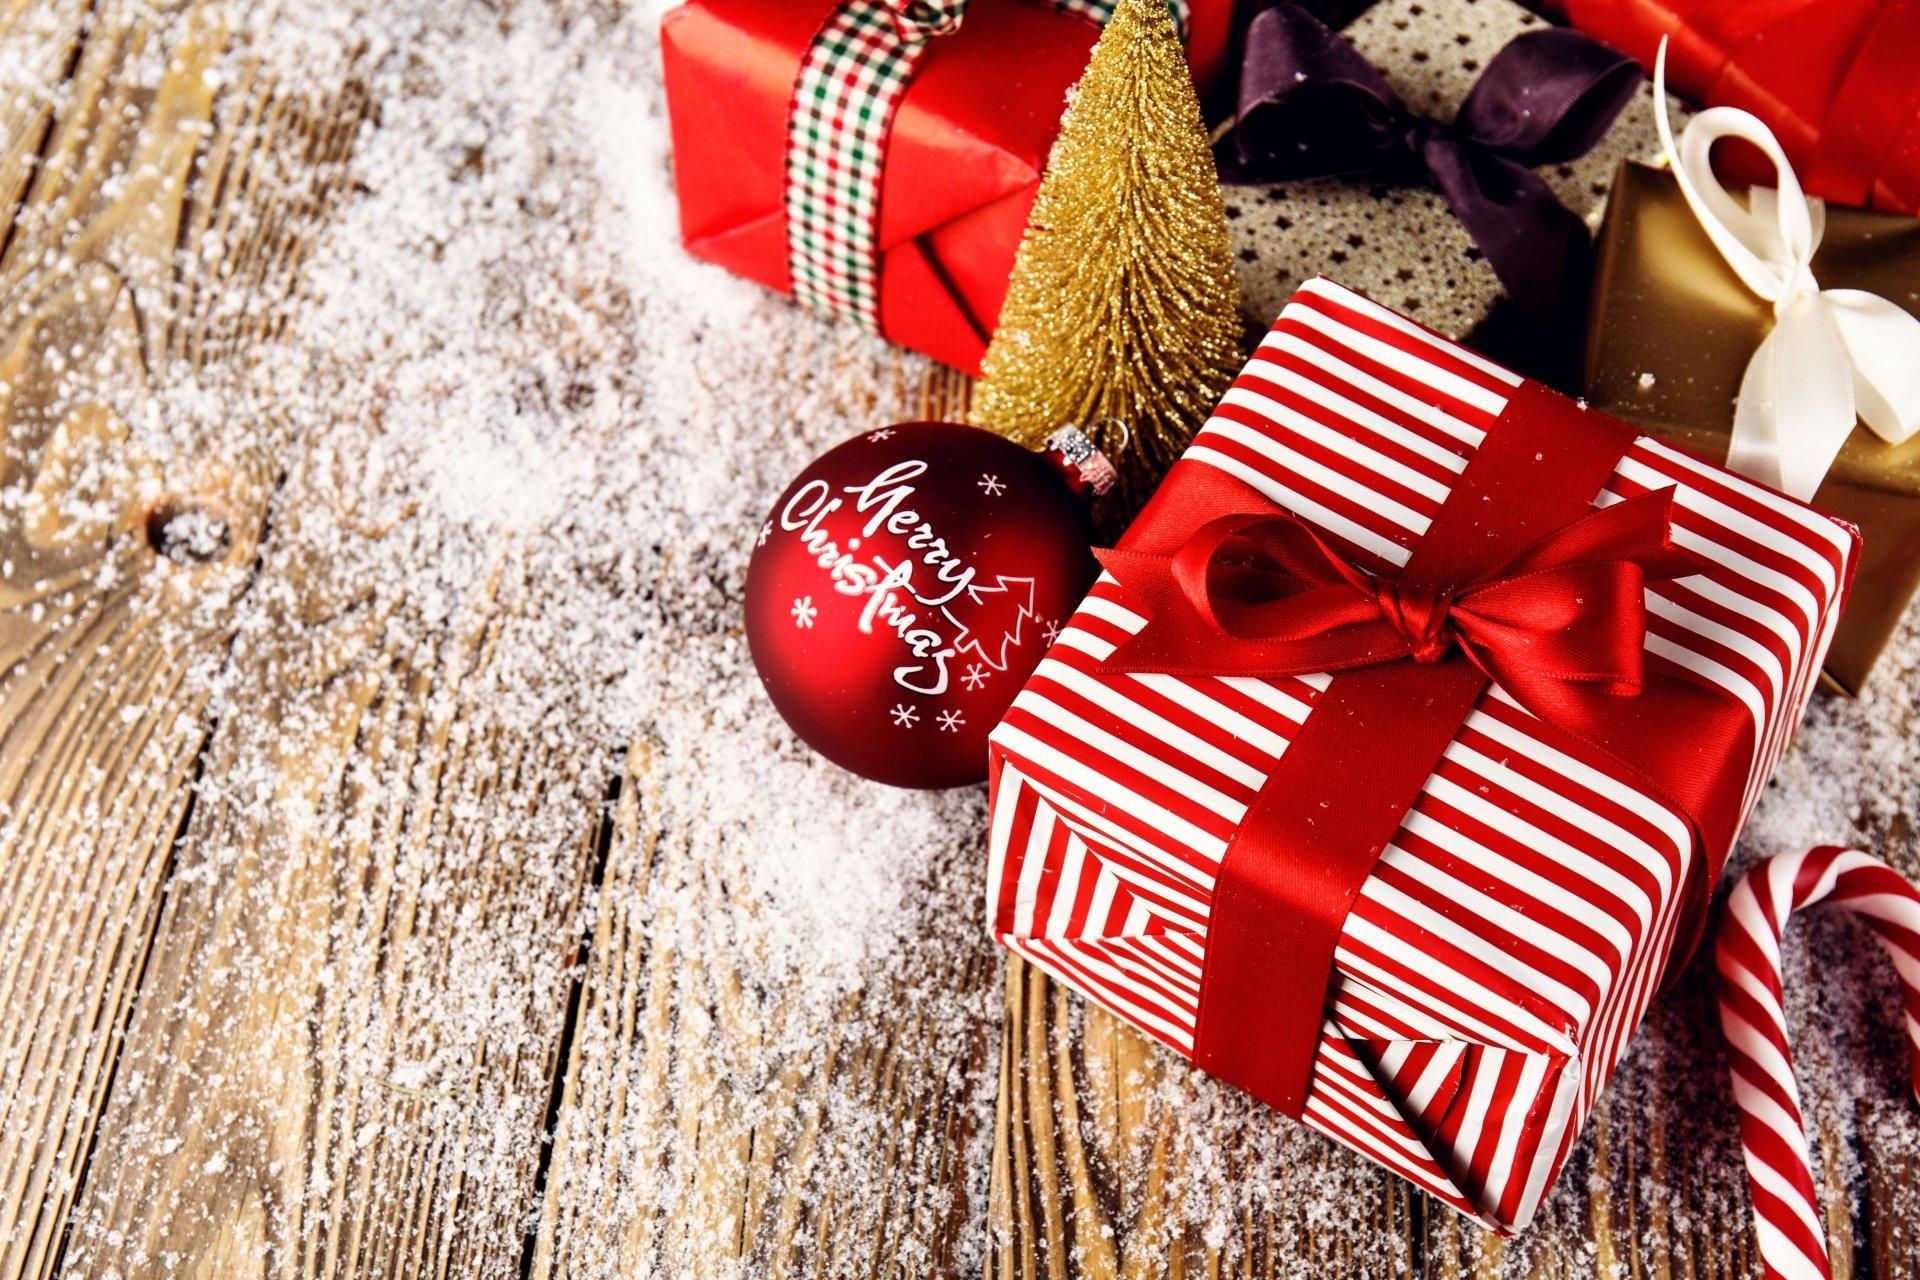 节日 - 圣诞节  礼物 Merry Christmas Christmas Ornaments 壁纸